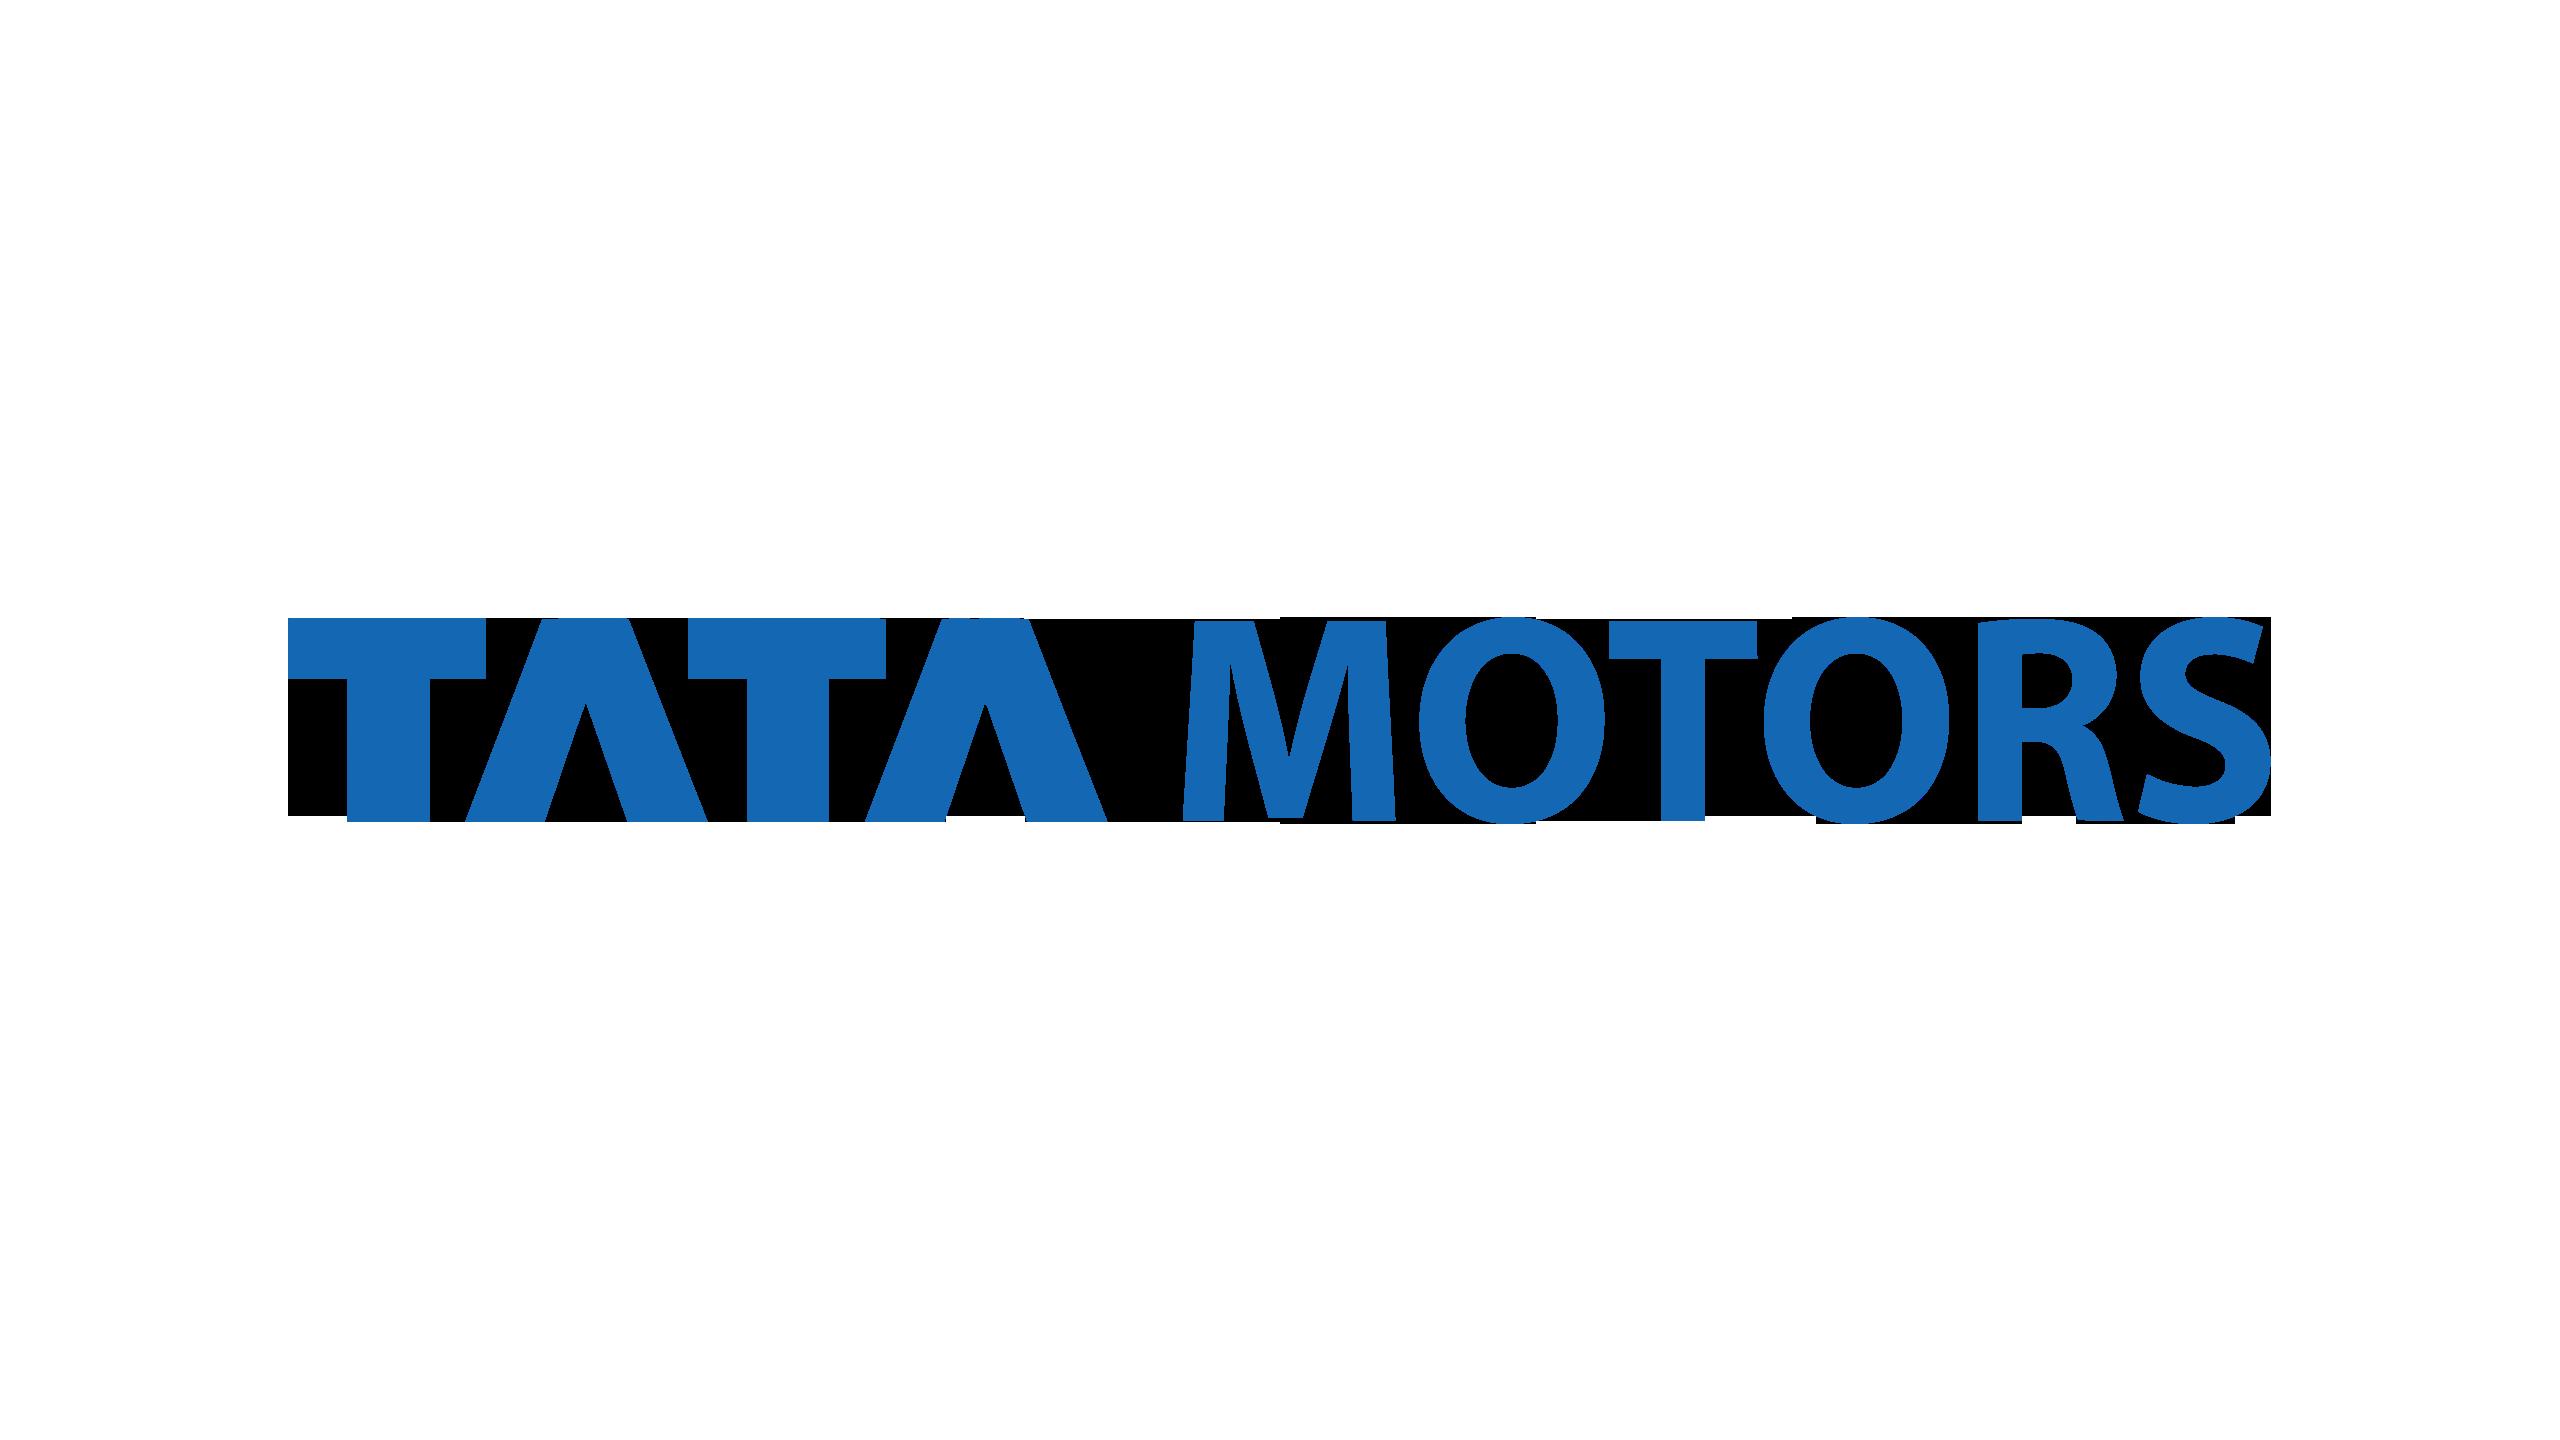 Tata Motors Logo 2560x1440 HD png - Tata PNG